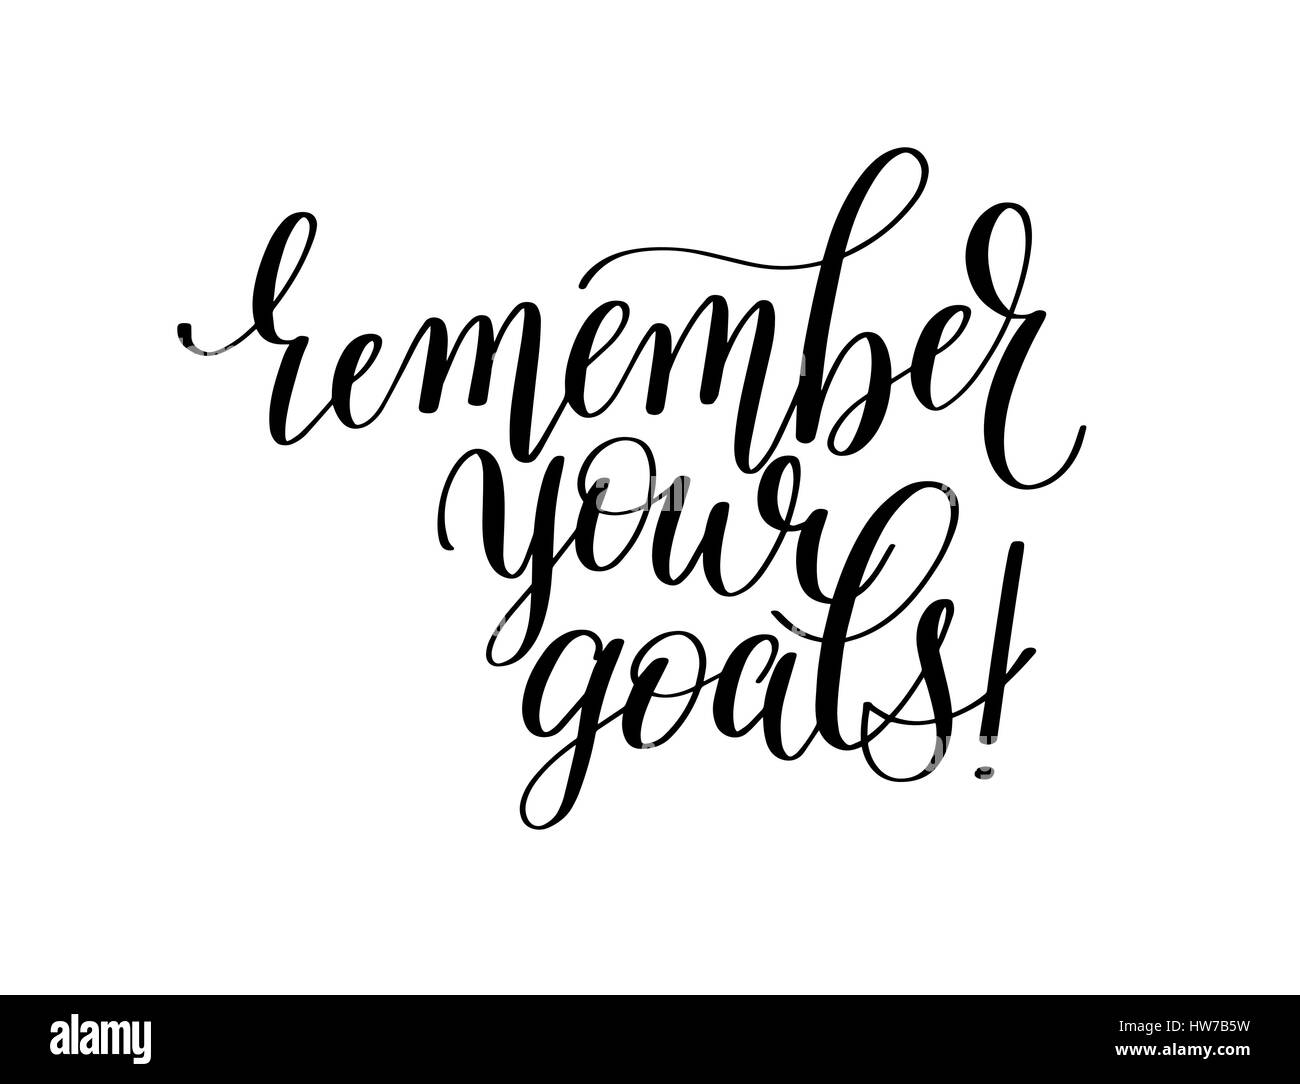 remember your goals - hand written lettering motivation positive - Stock Vector